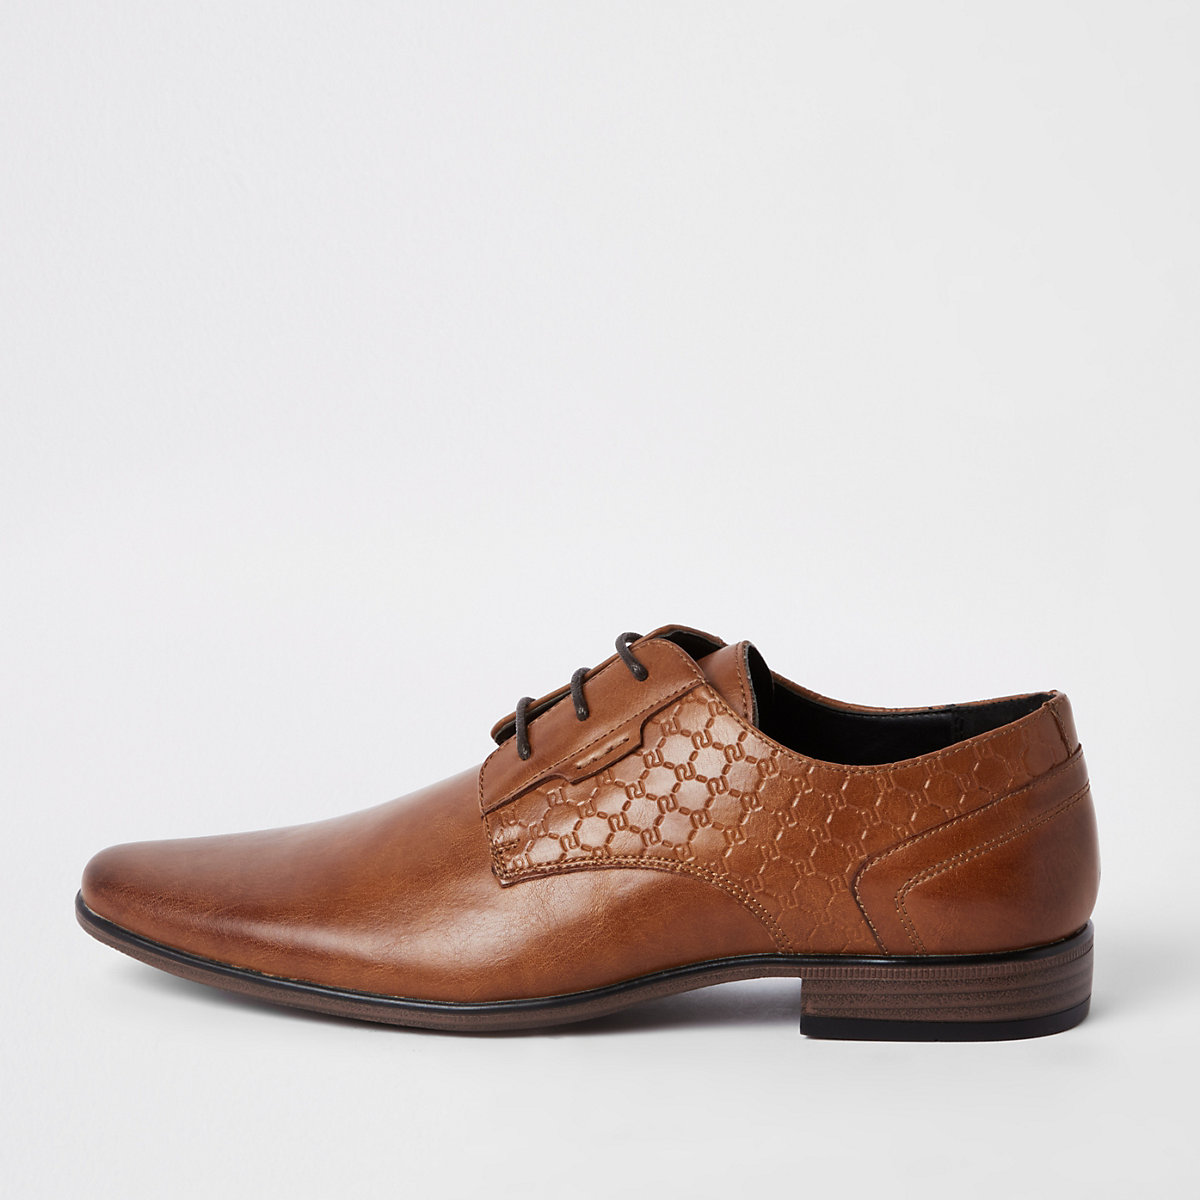 Brown 'RI' embossed derby shoes